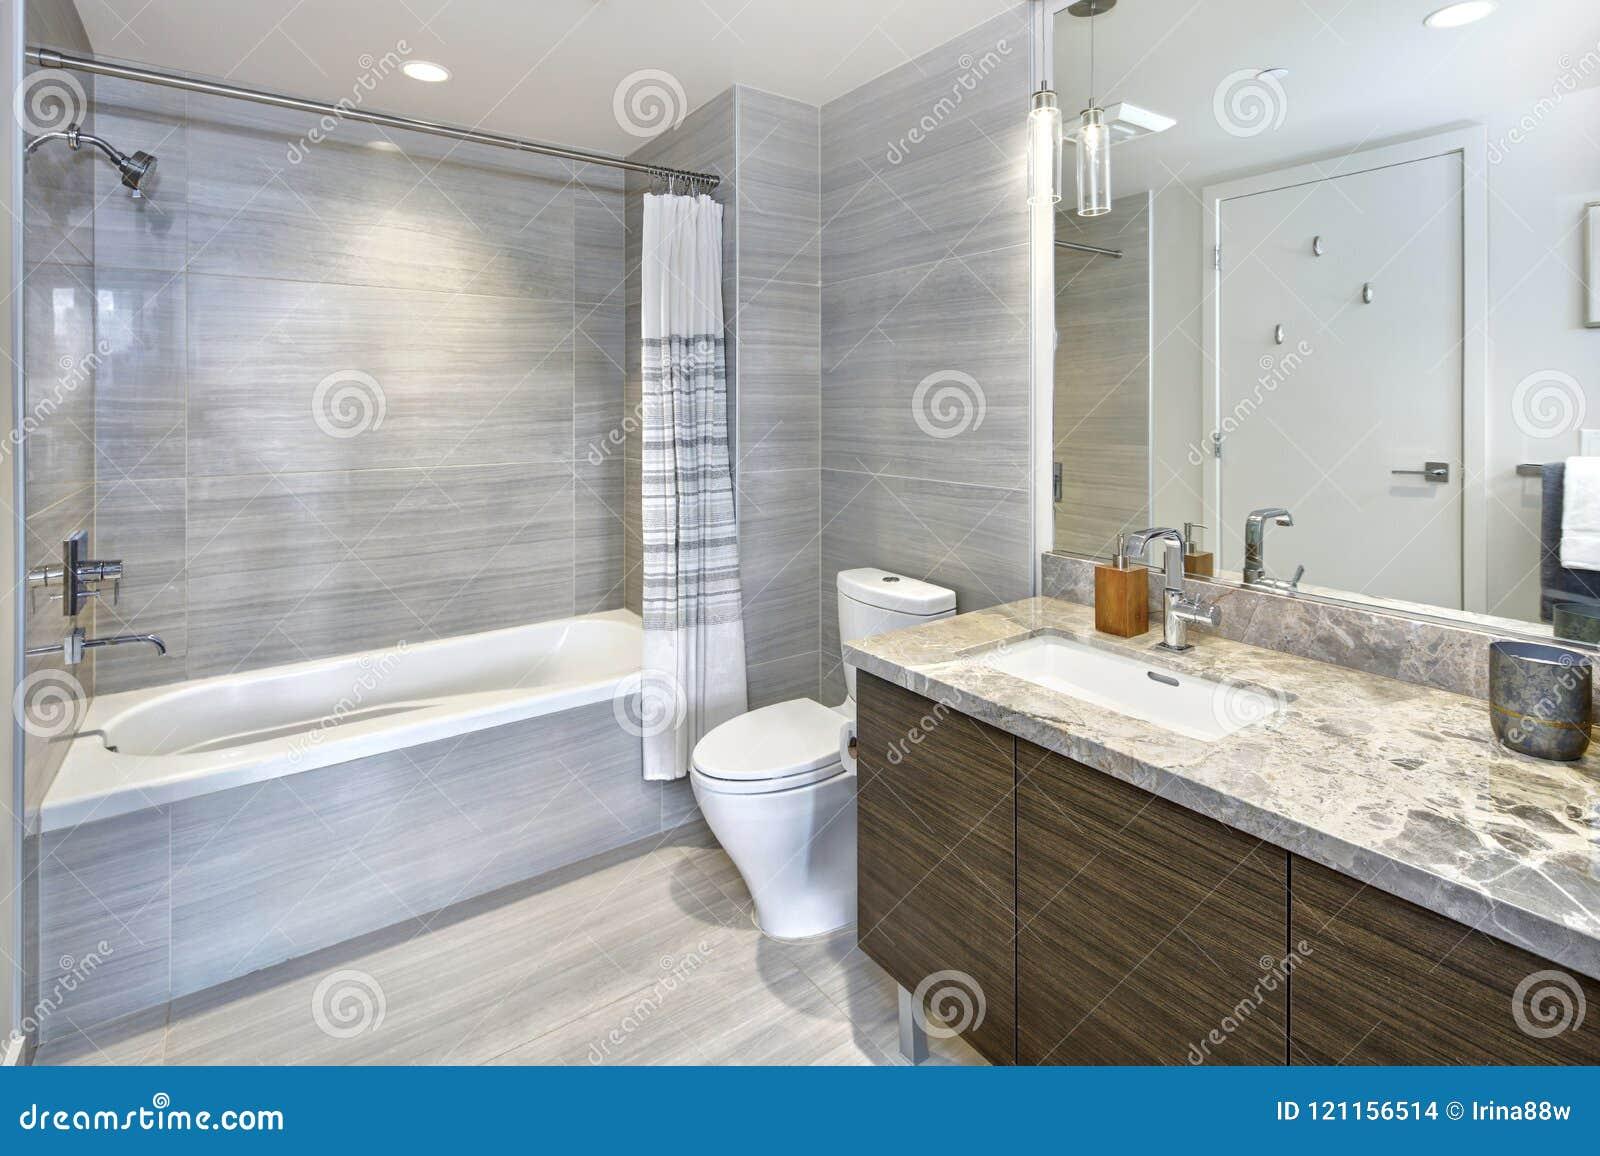 modern stylish condo bathroom design with gray tiling stock photo rh dreamstime com